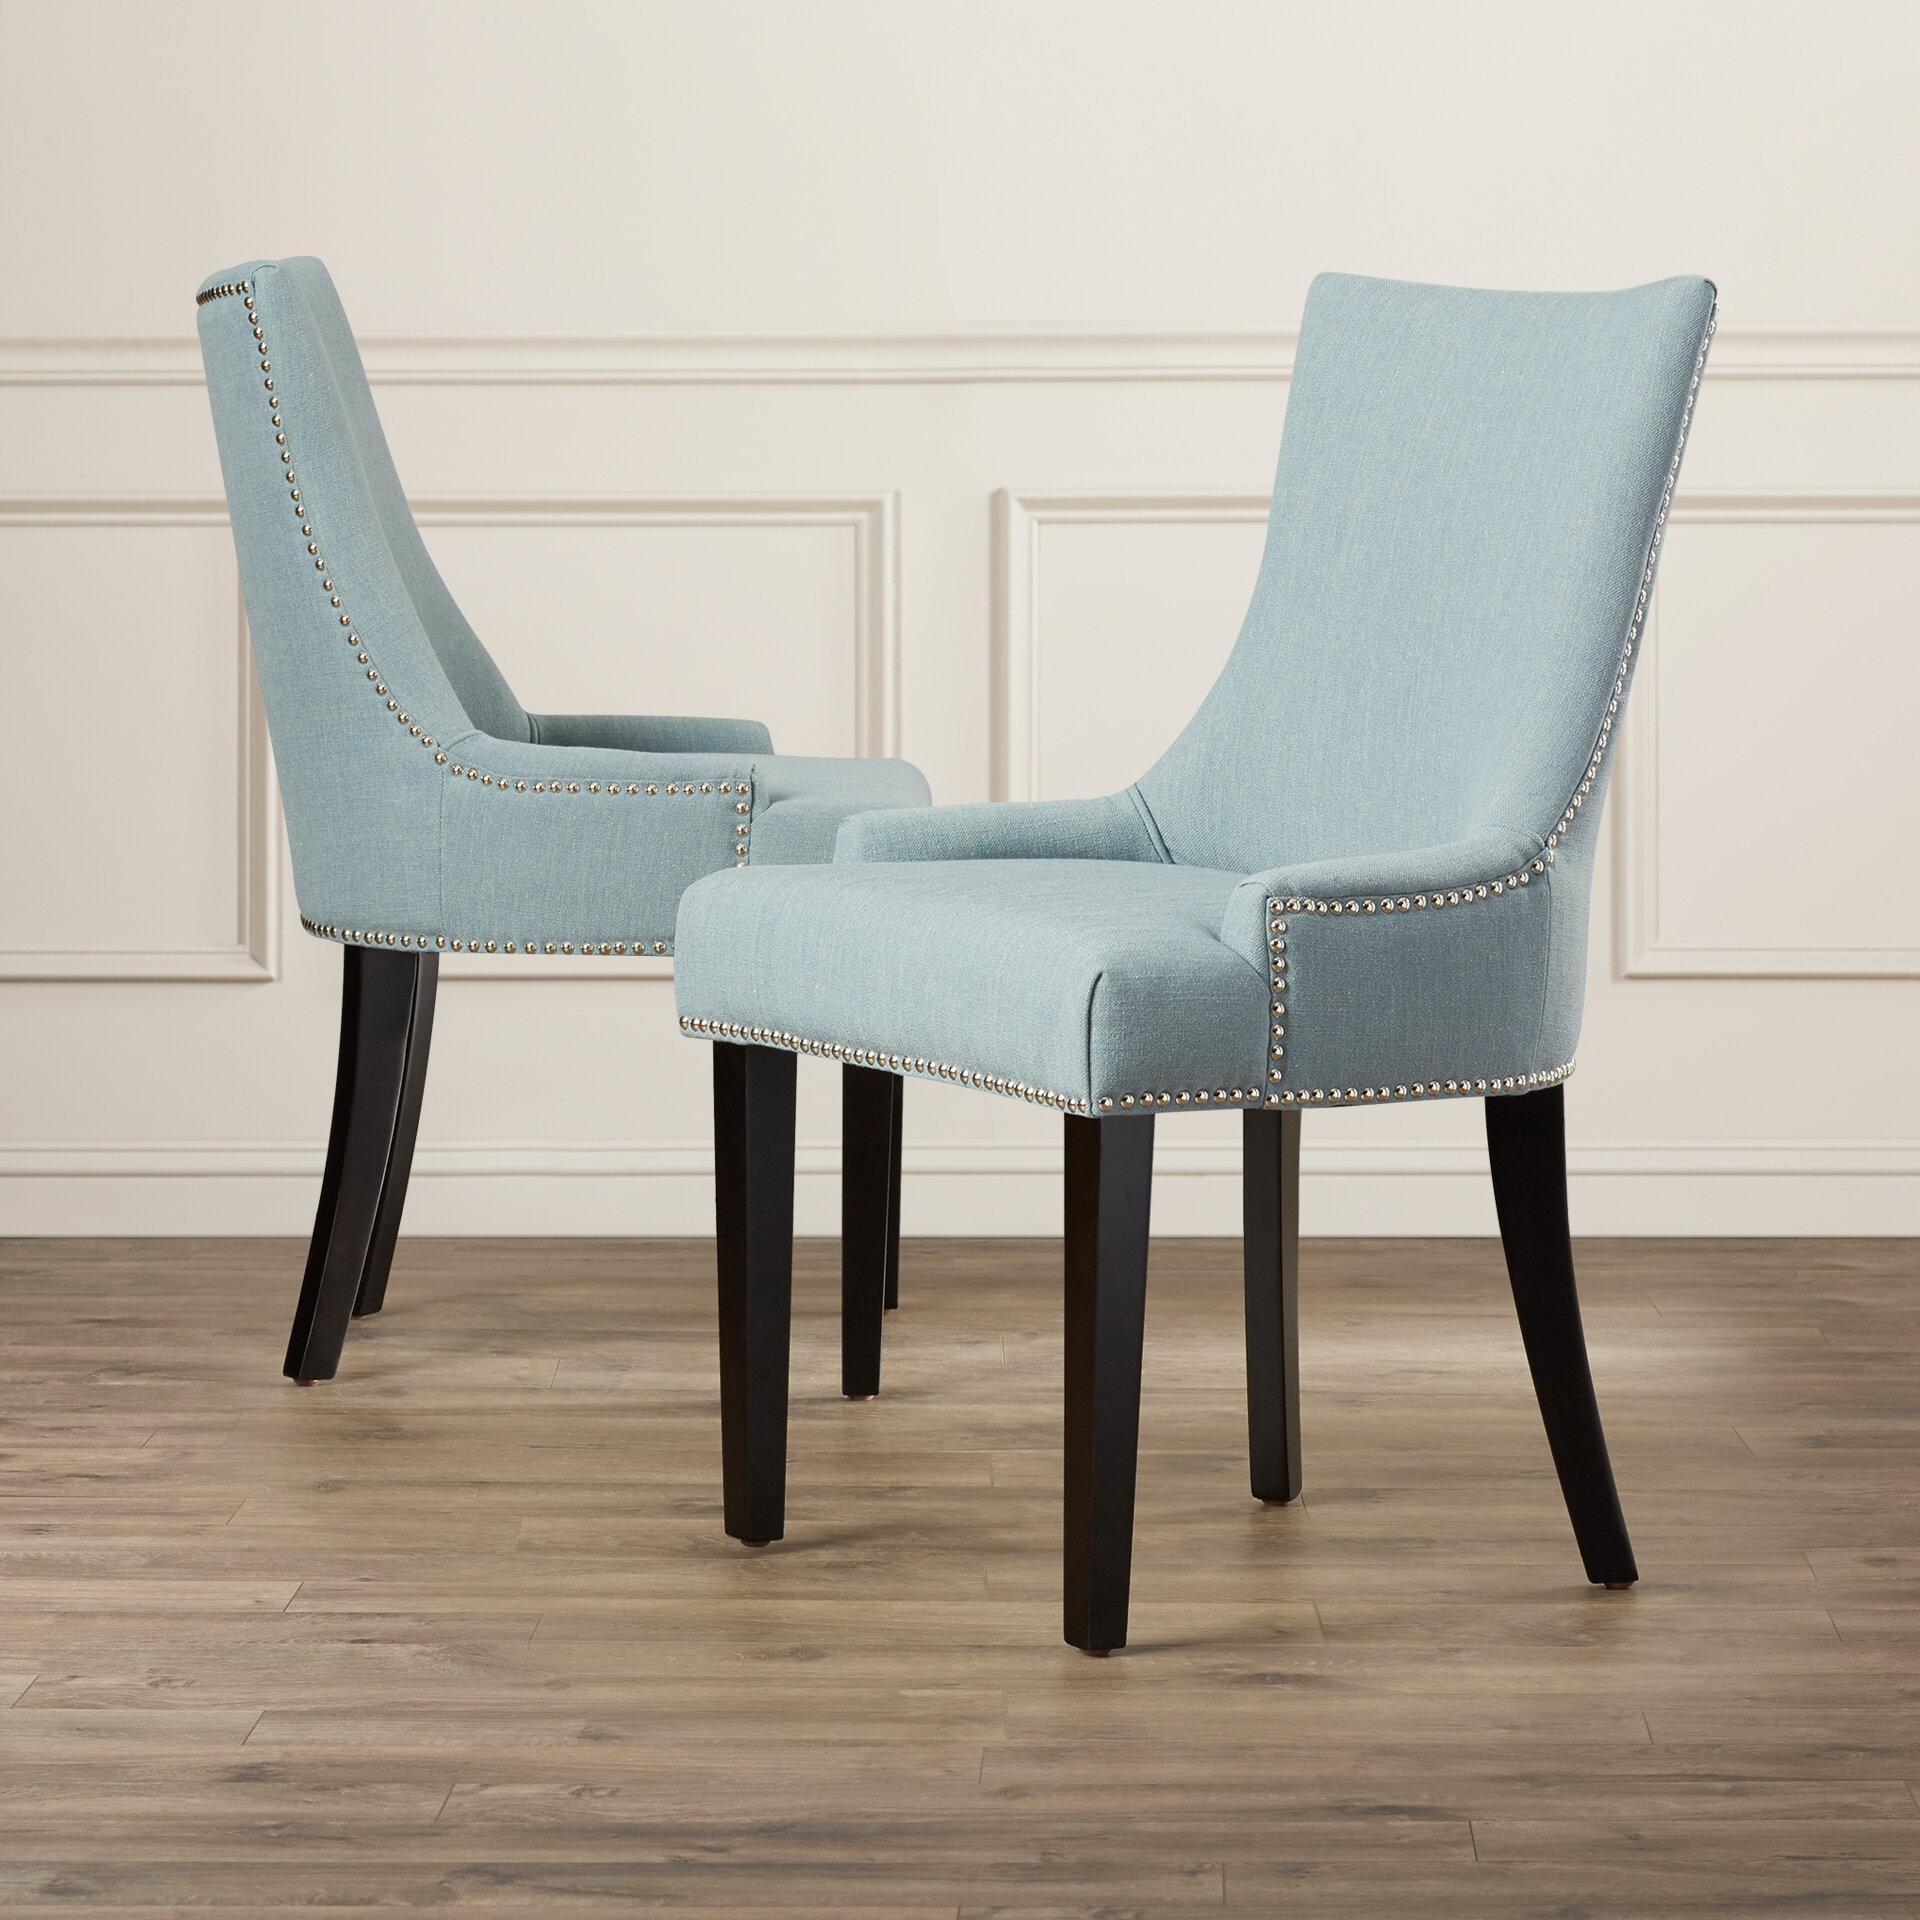 Mercer41 Carraway Upholstered Dining Chair & Reviews | Wayfair